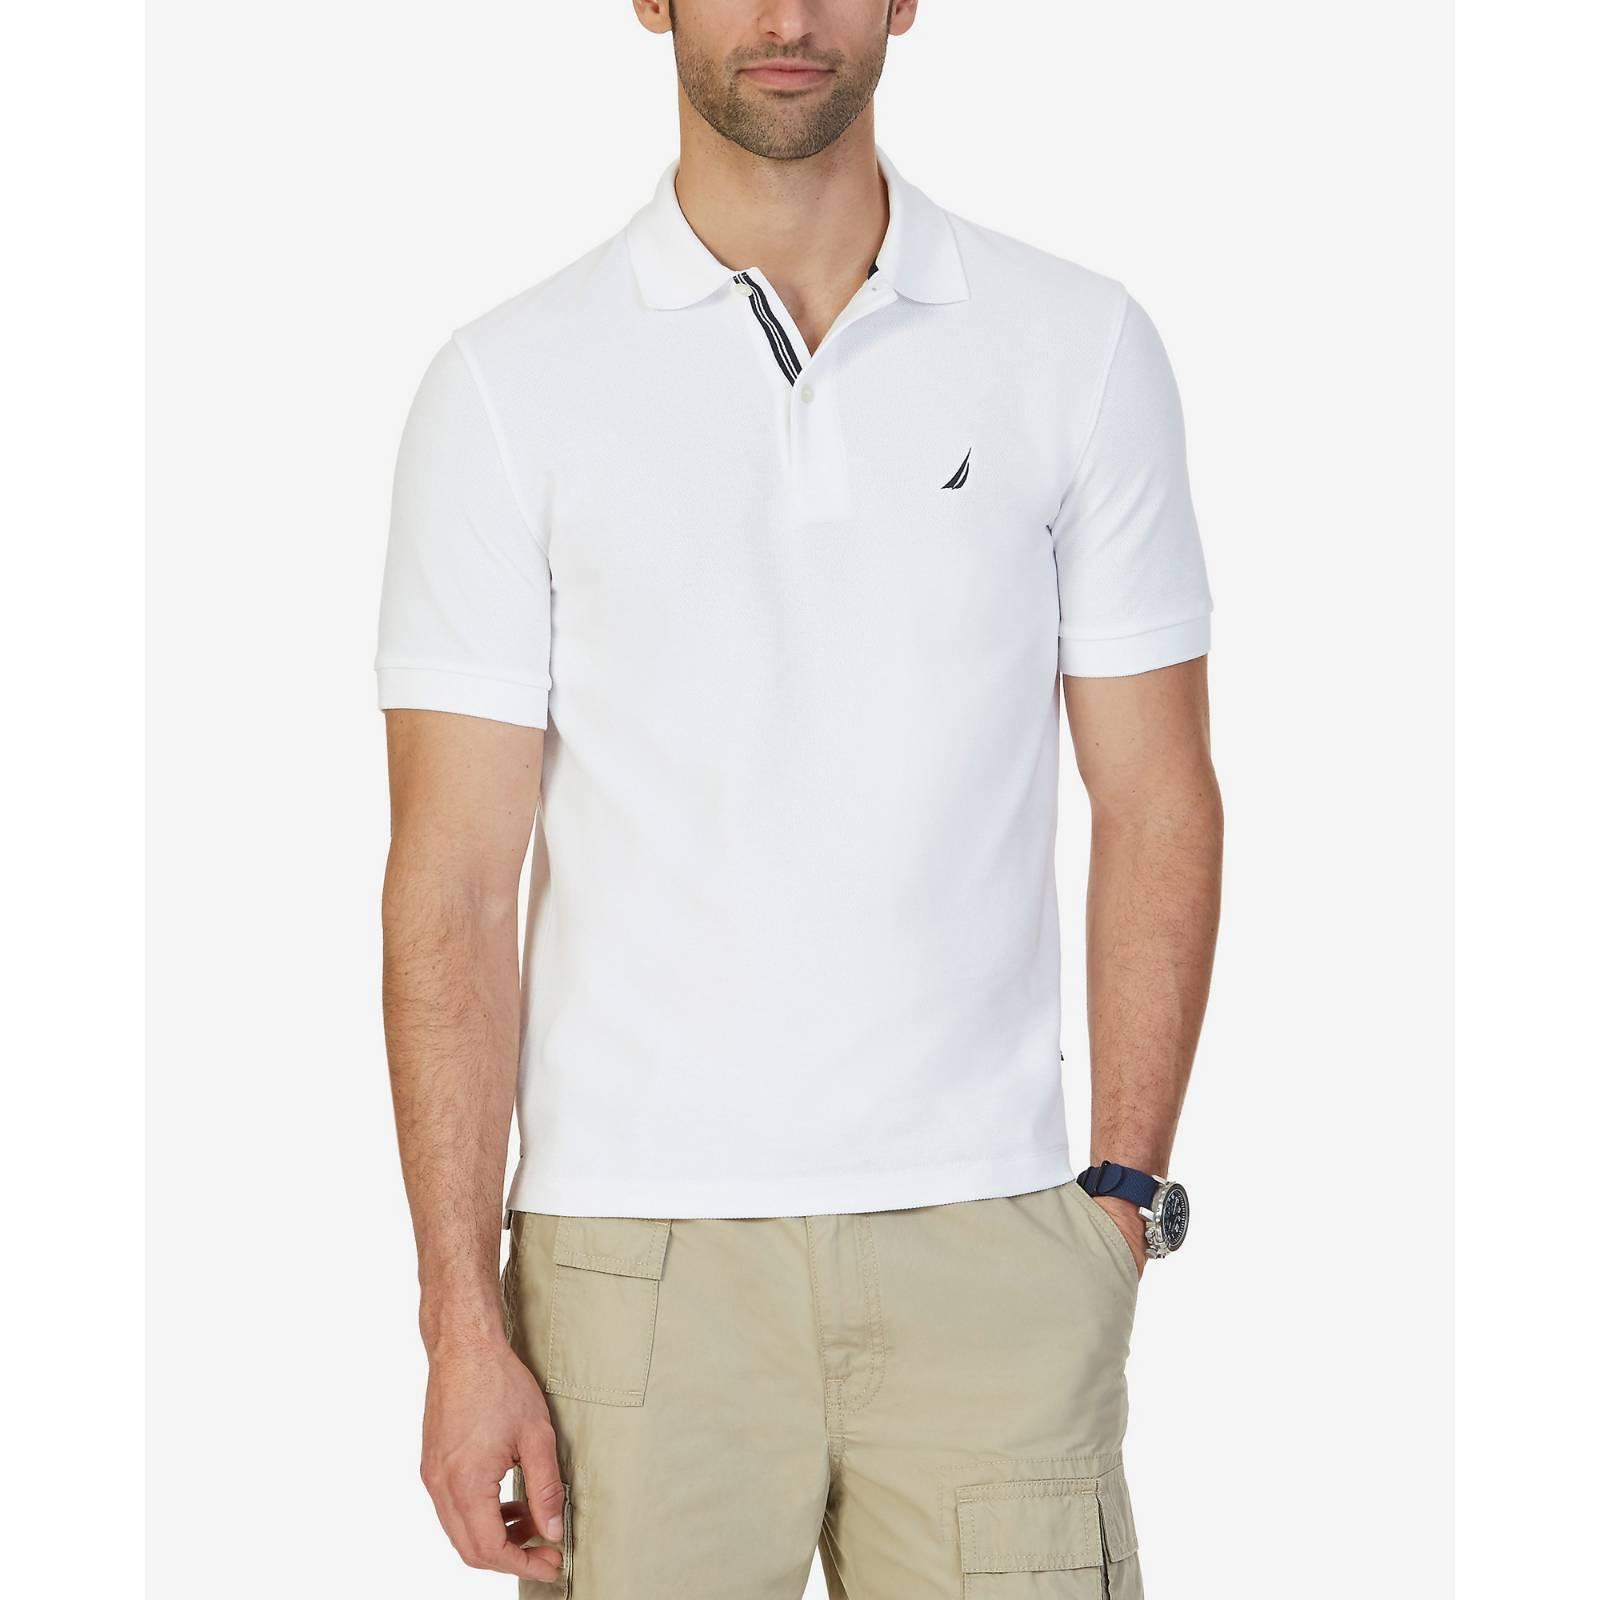 NAUTICA Men CLASSIC-FIT WHITE SHORT-SLEEVE POLO KNIT LOGO TOP DRESS SHIRT L